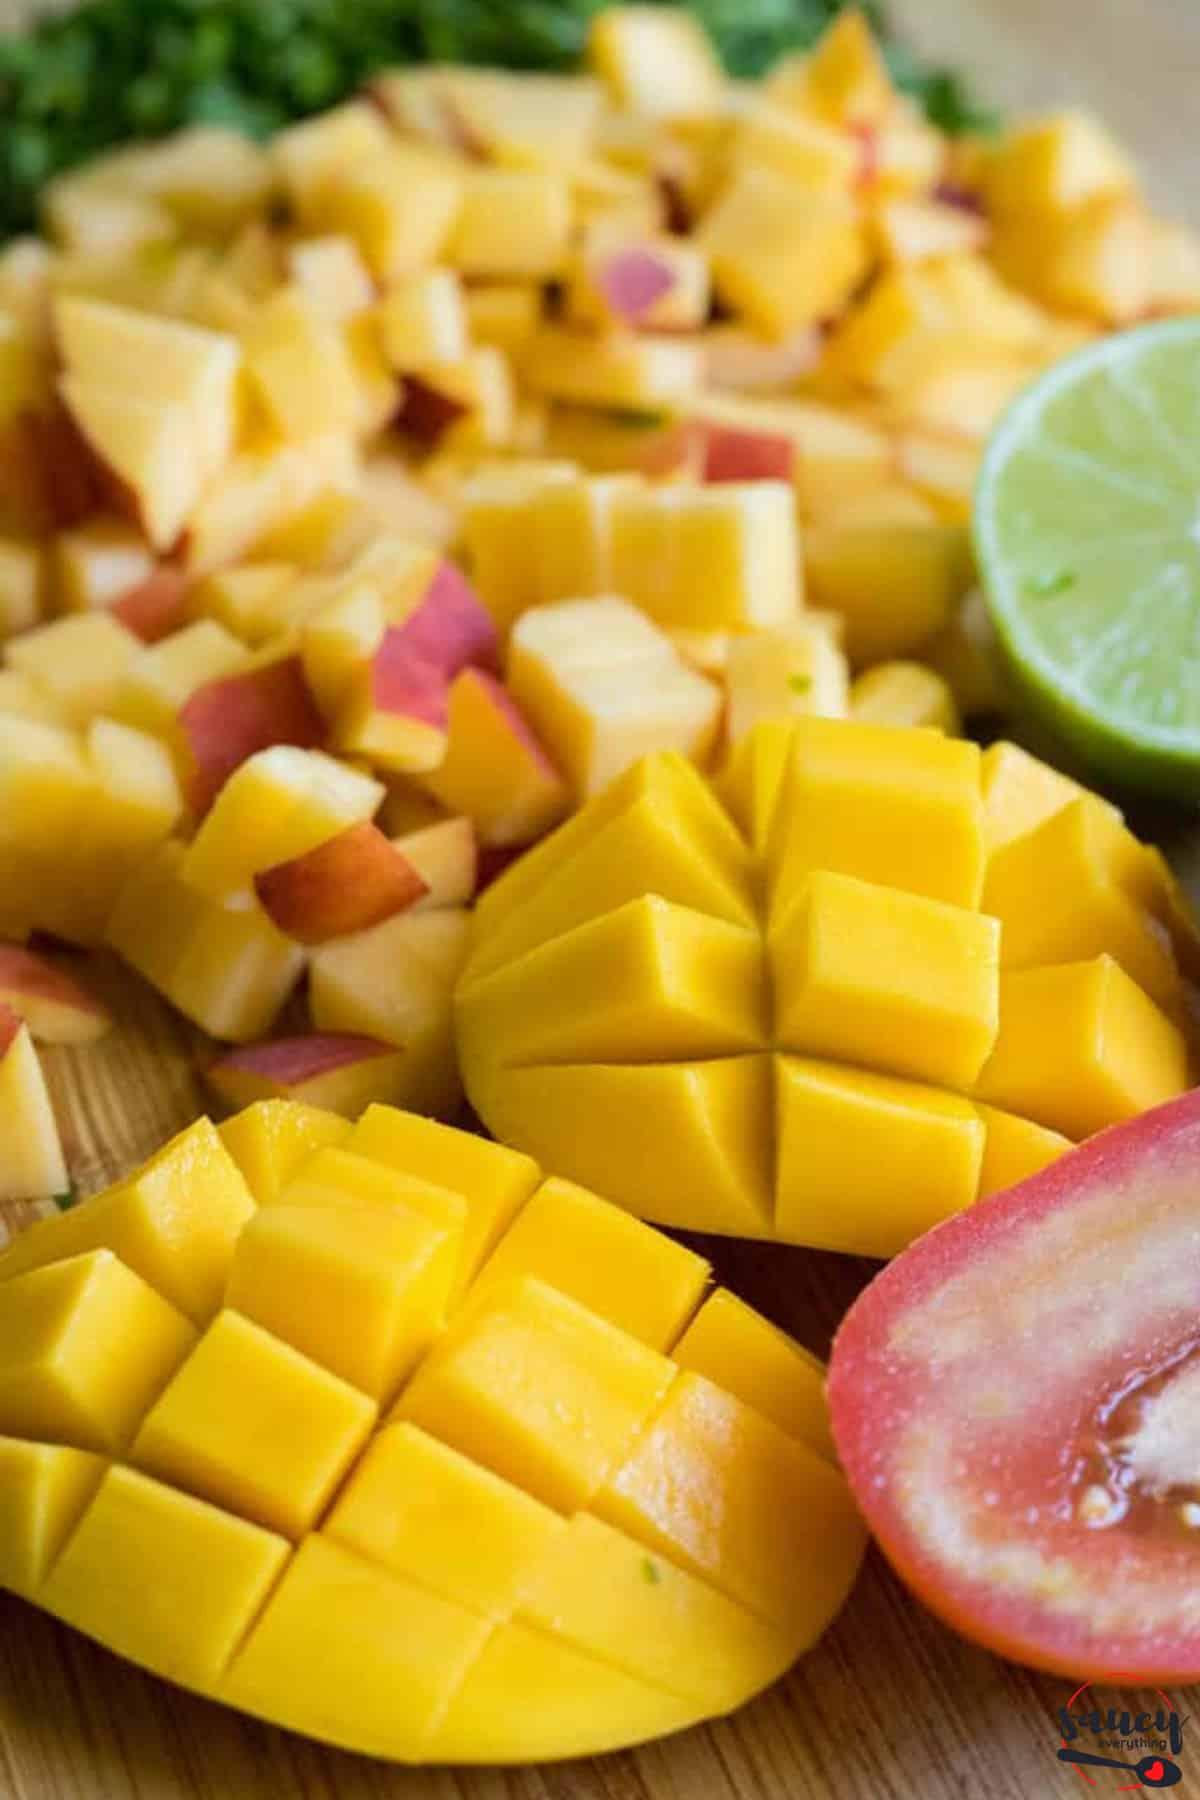 Ingredients to make peach salsa